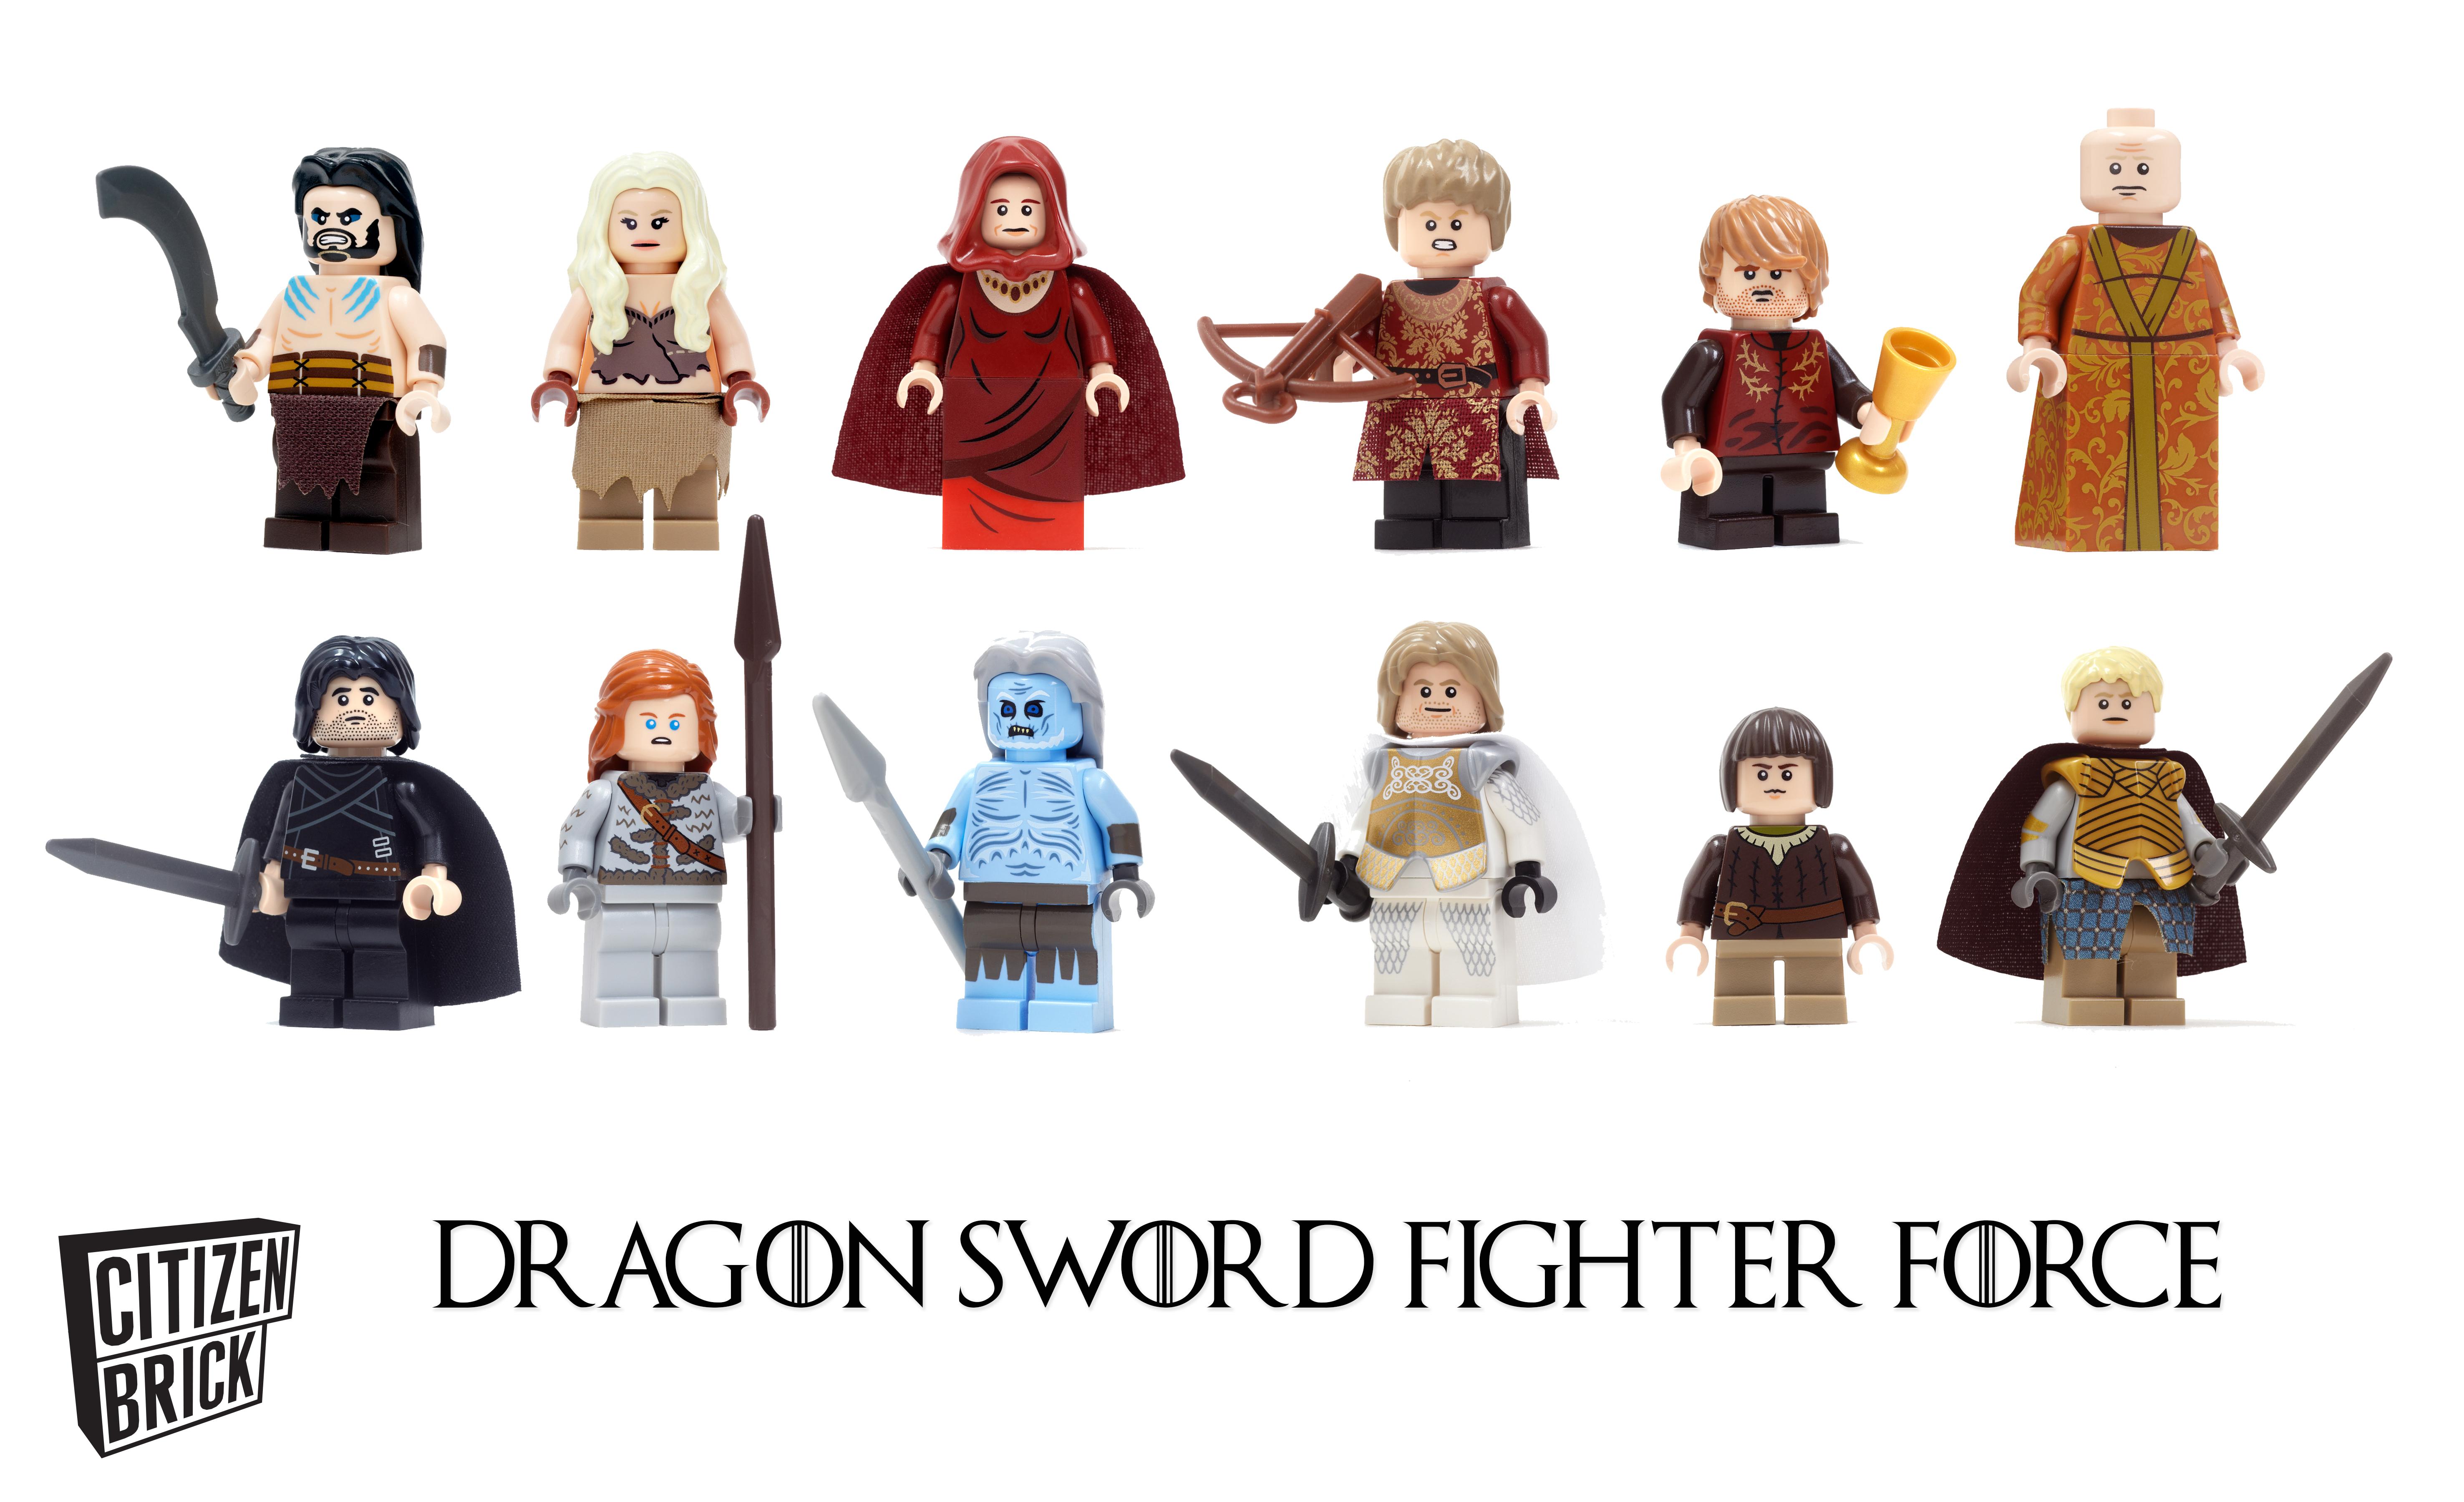 Game of Thrones Figures